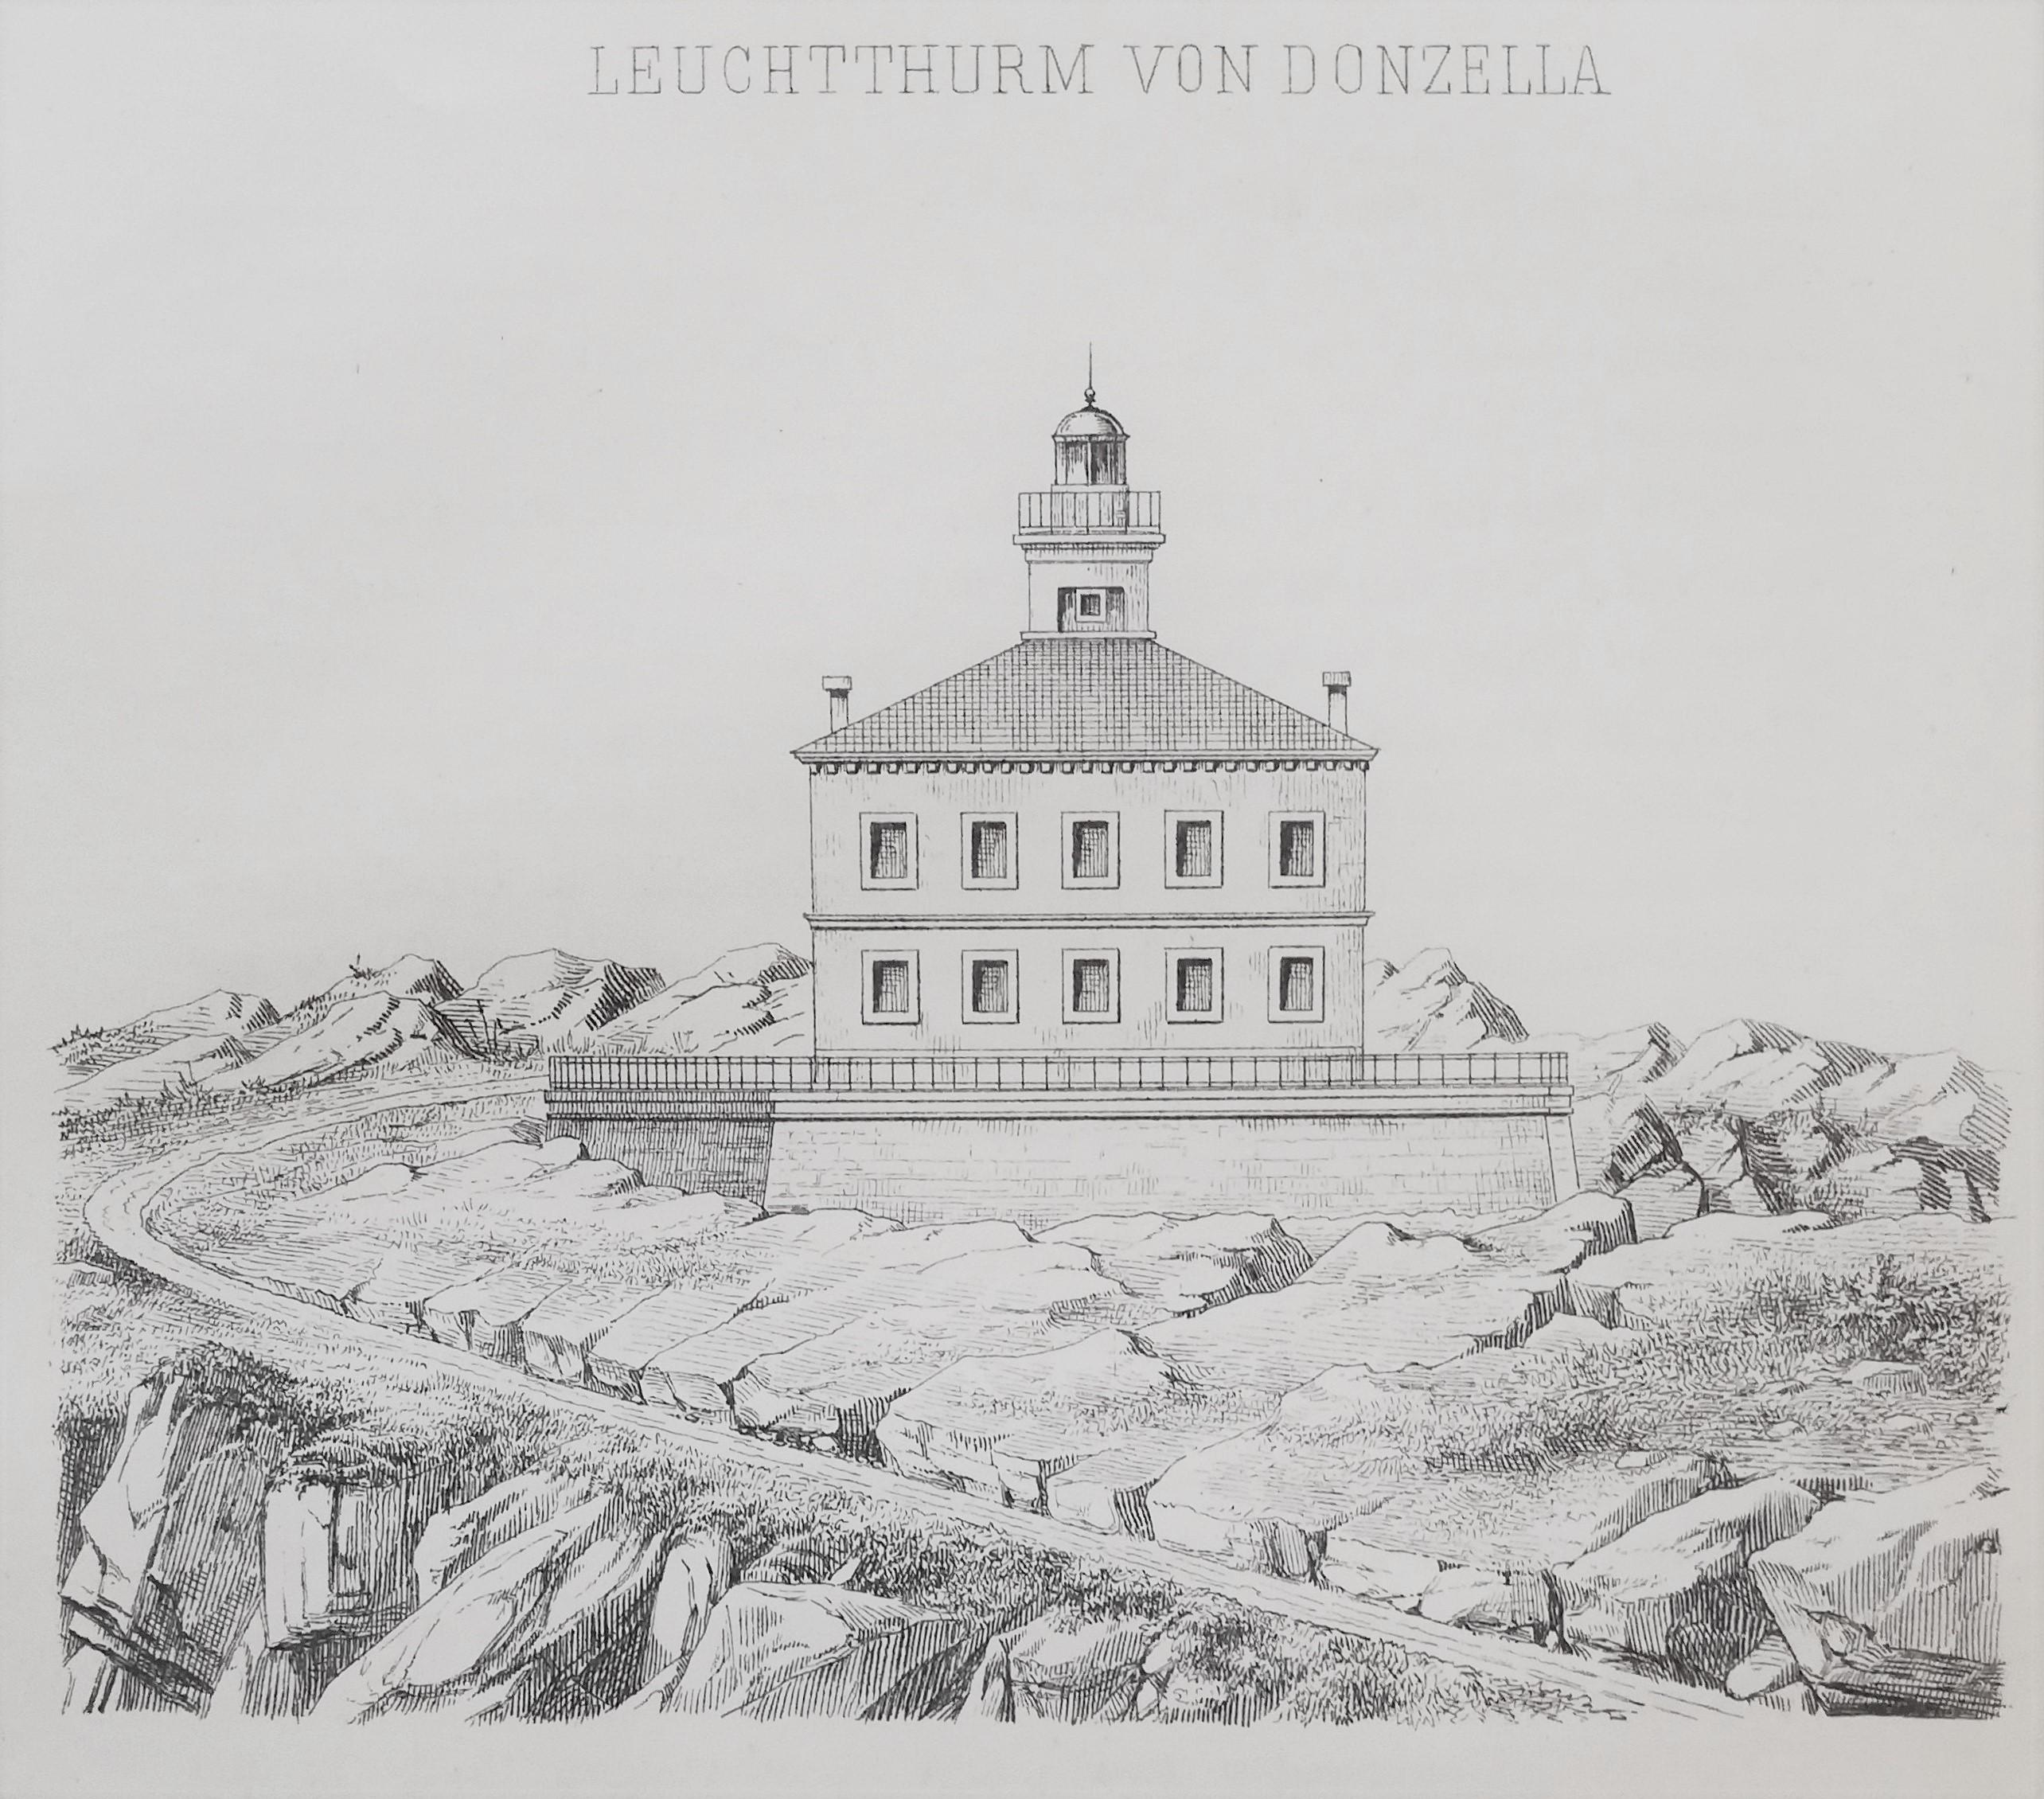 Leuchtturm auf Donzella (heute Sveti Andrija)